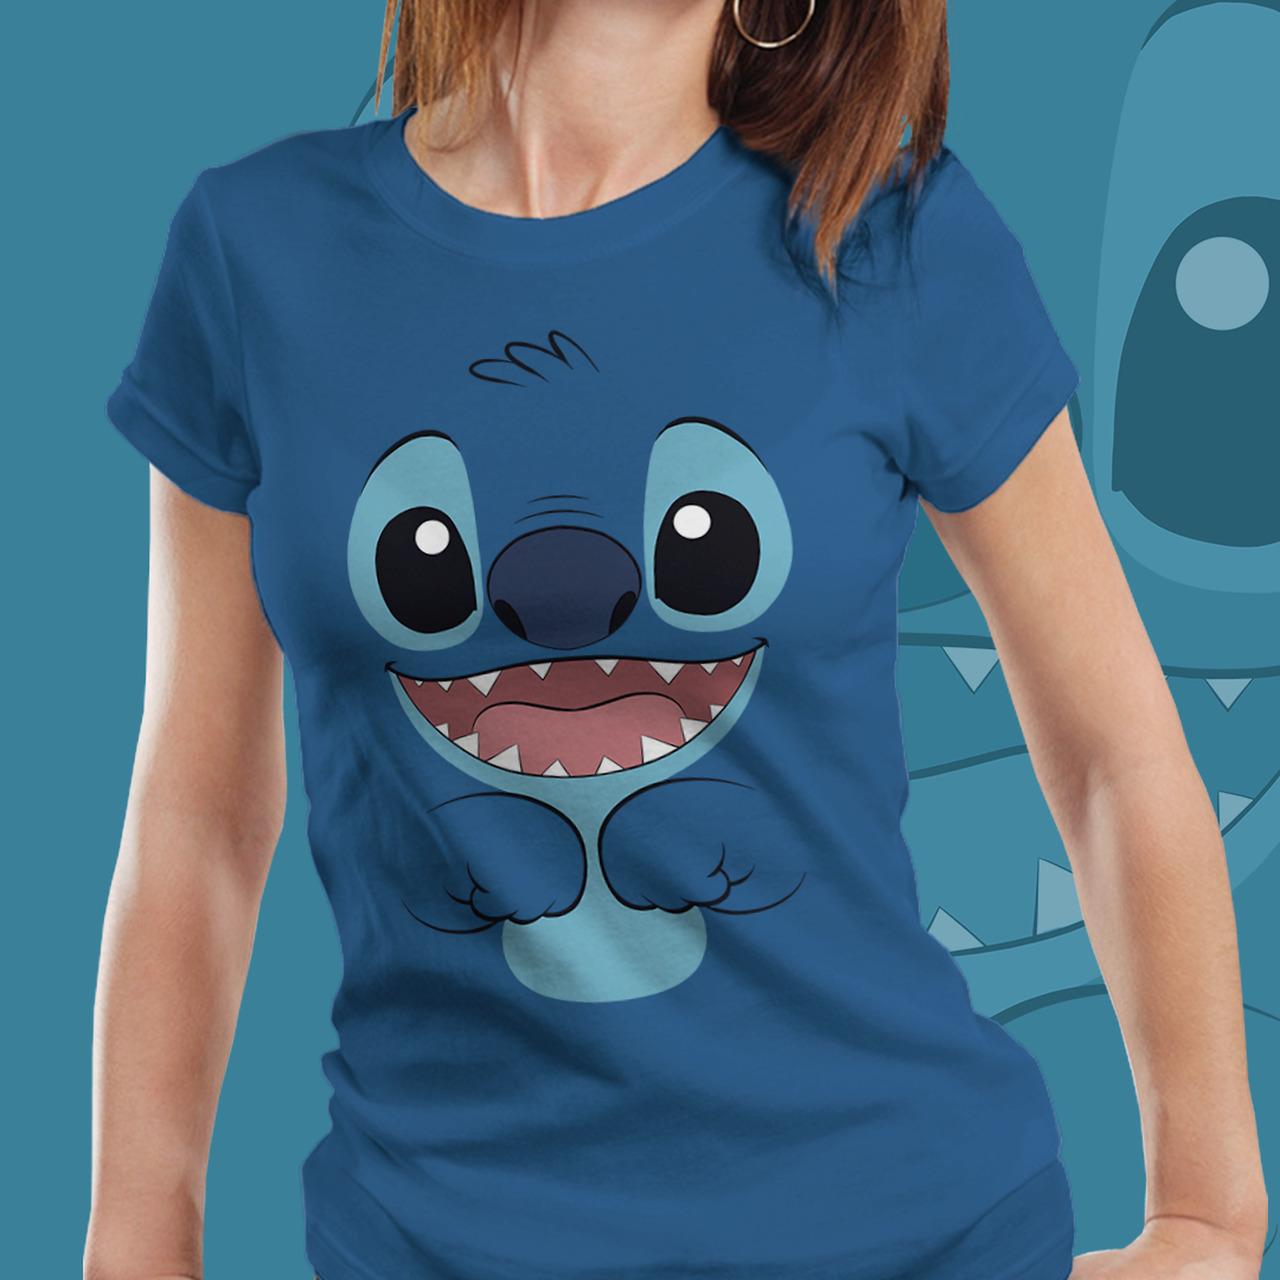 Camiseta Feminina Stitch: Lilo & Stitch